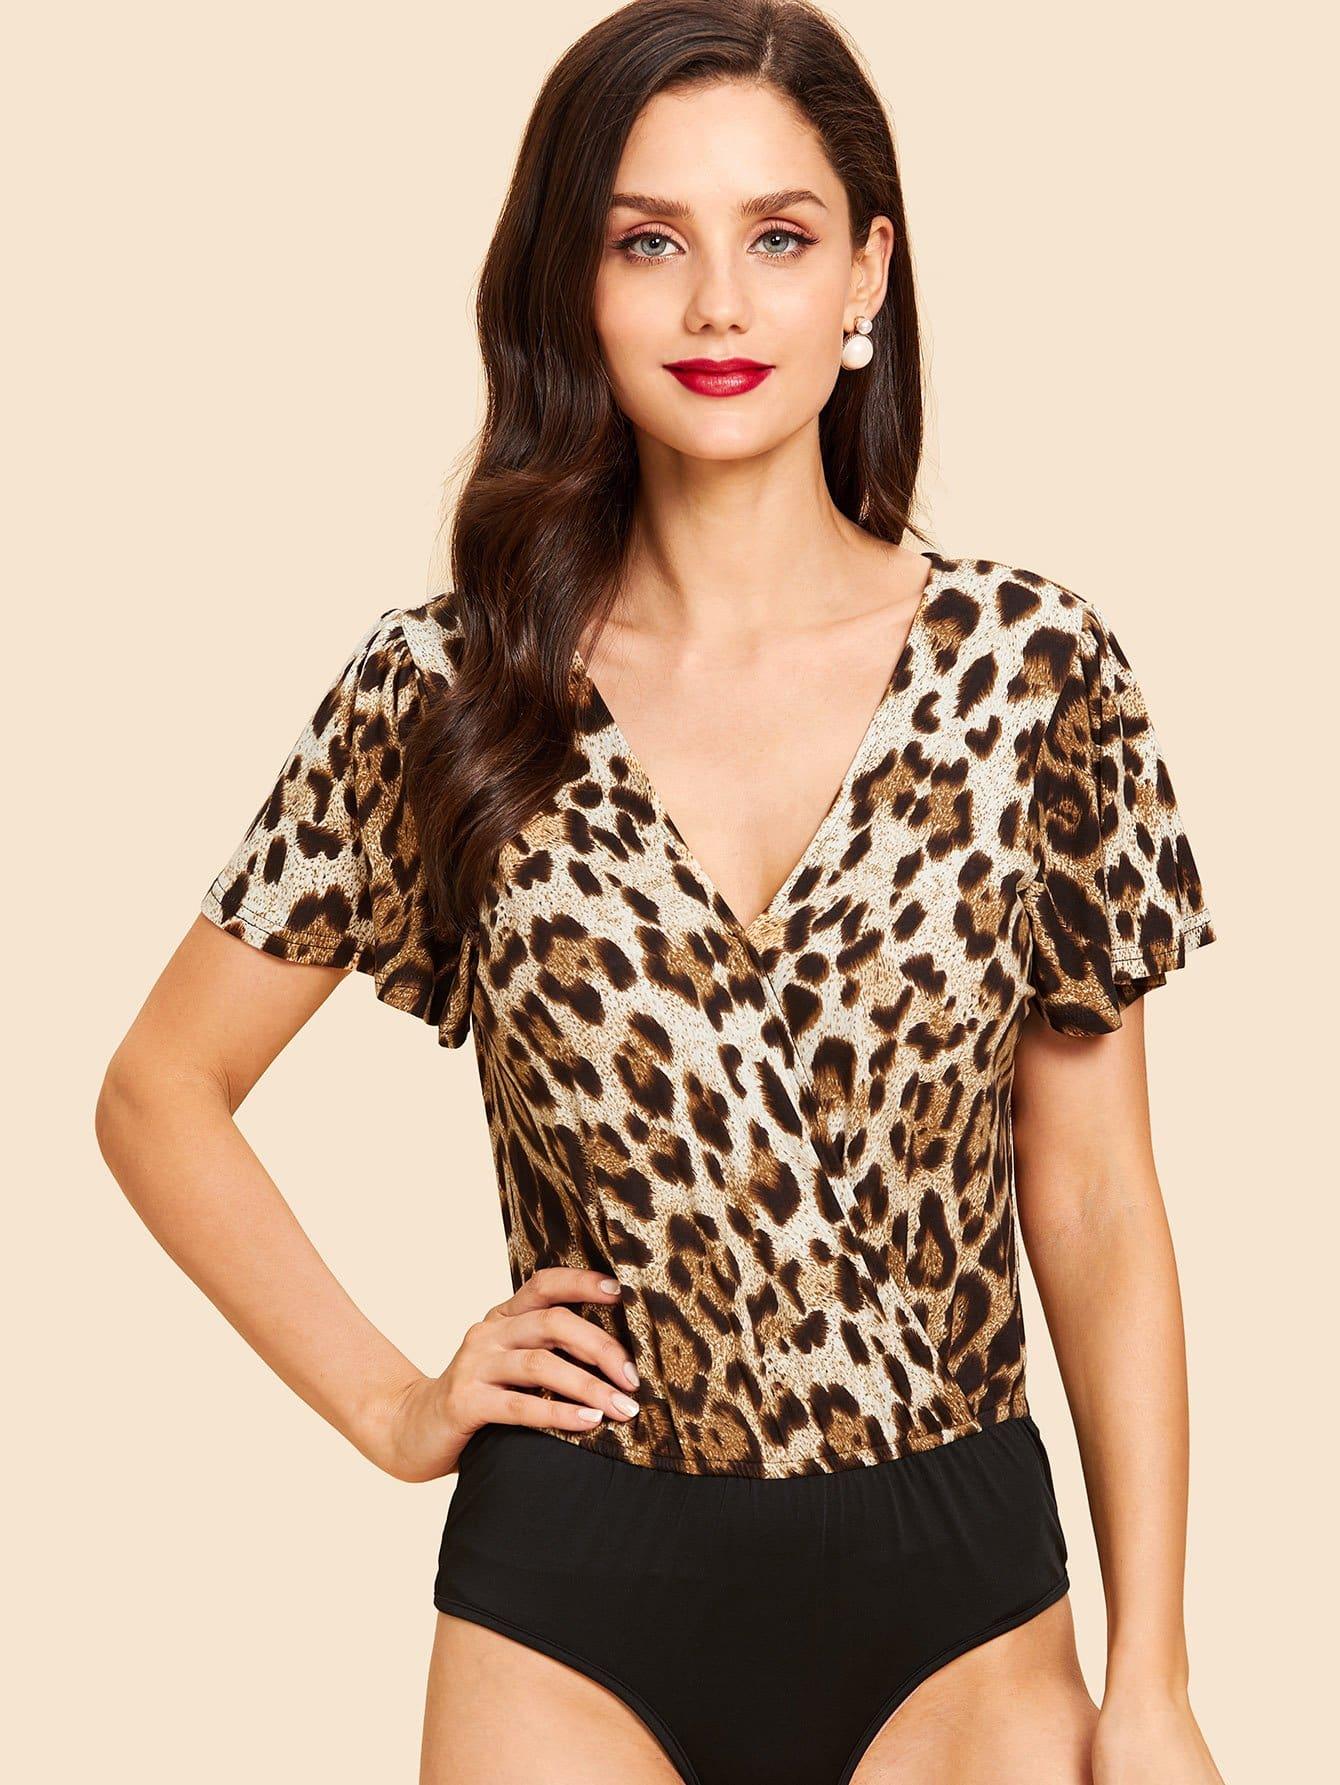 Задняя крышка для брошюры Leopard Print Bodysuit